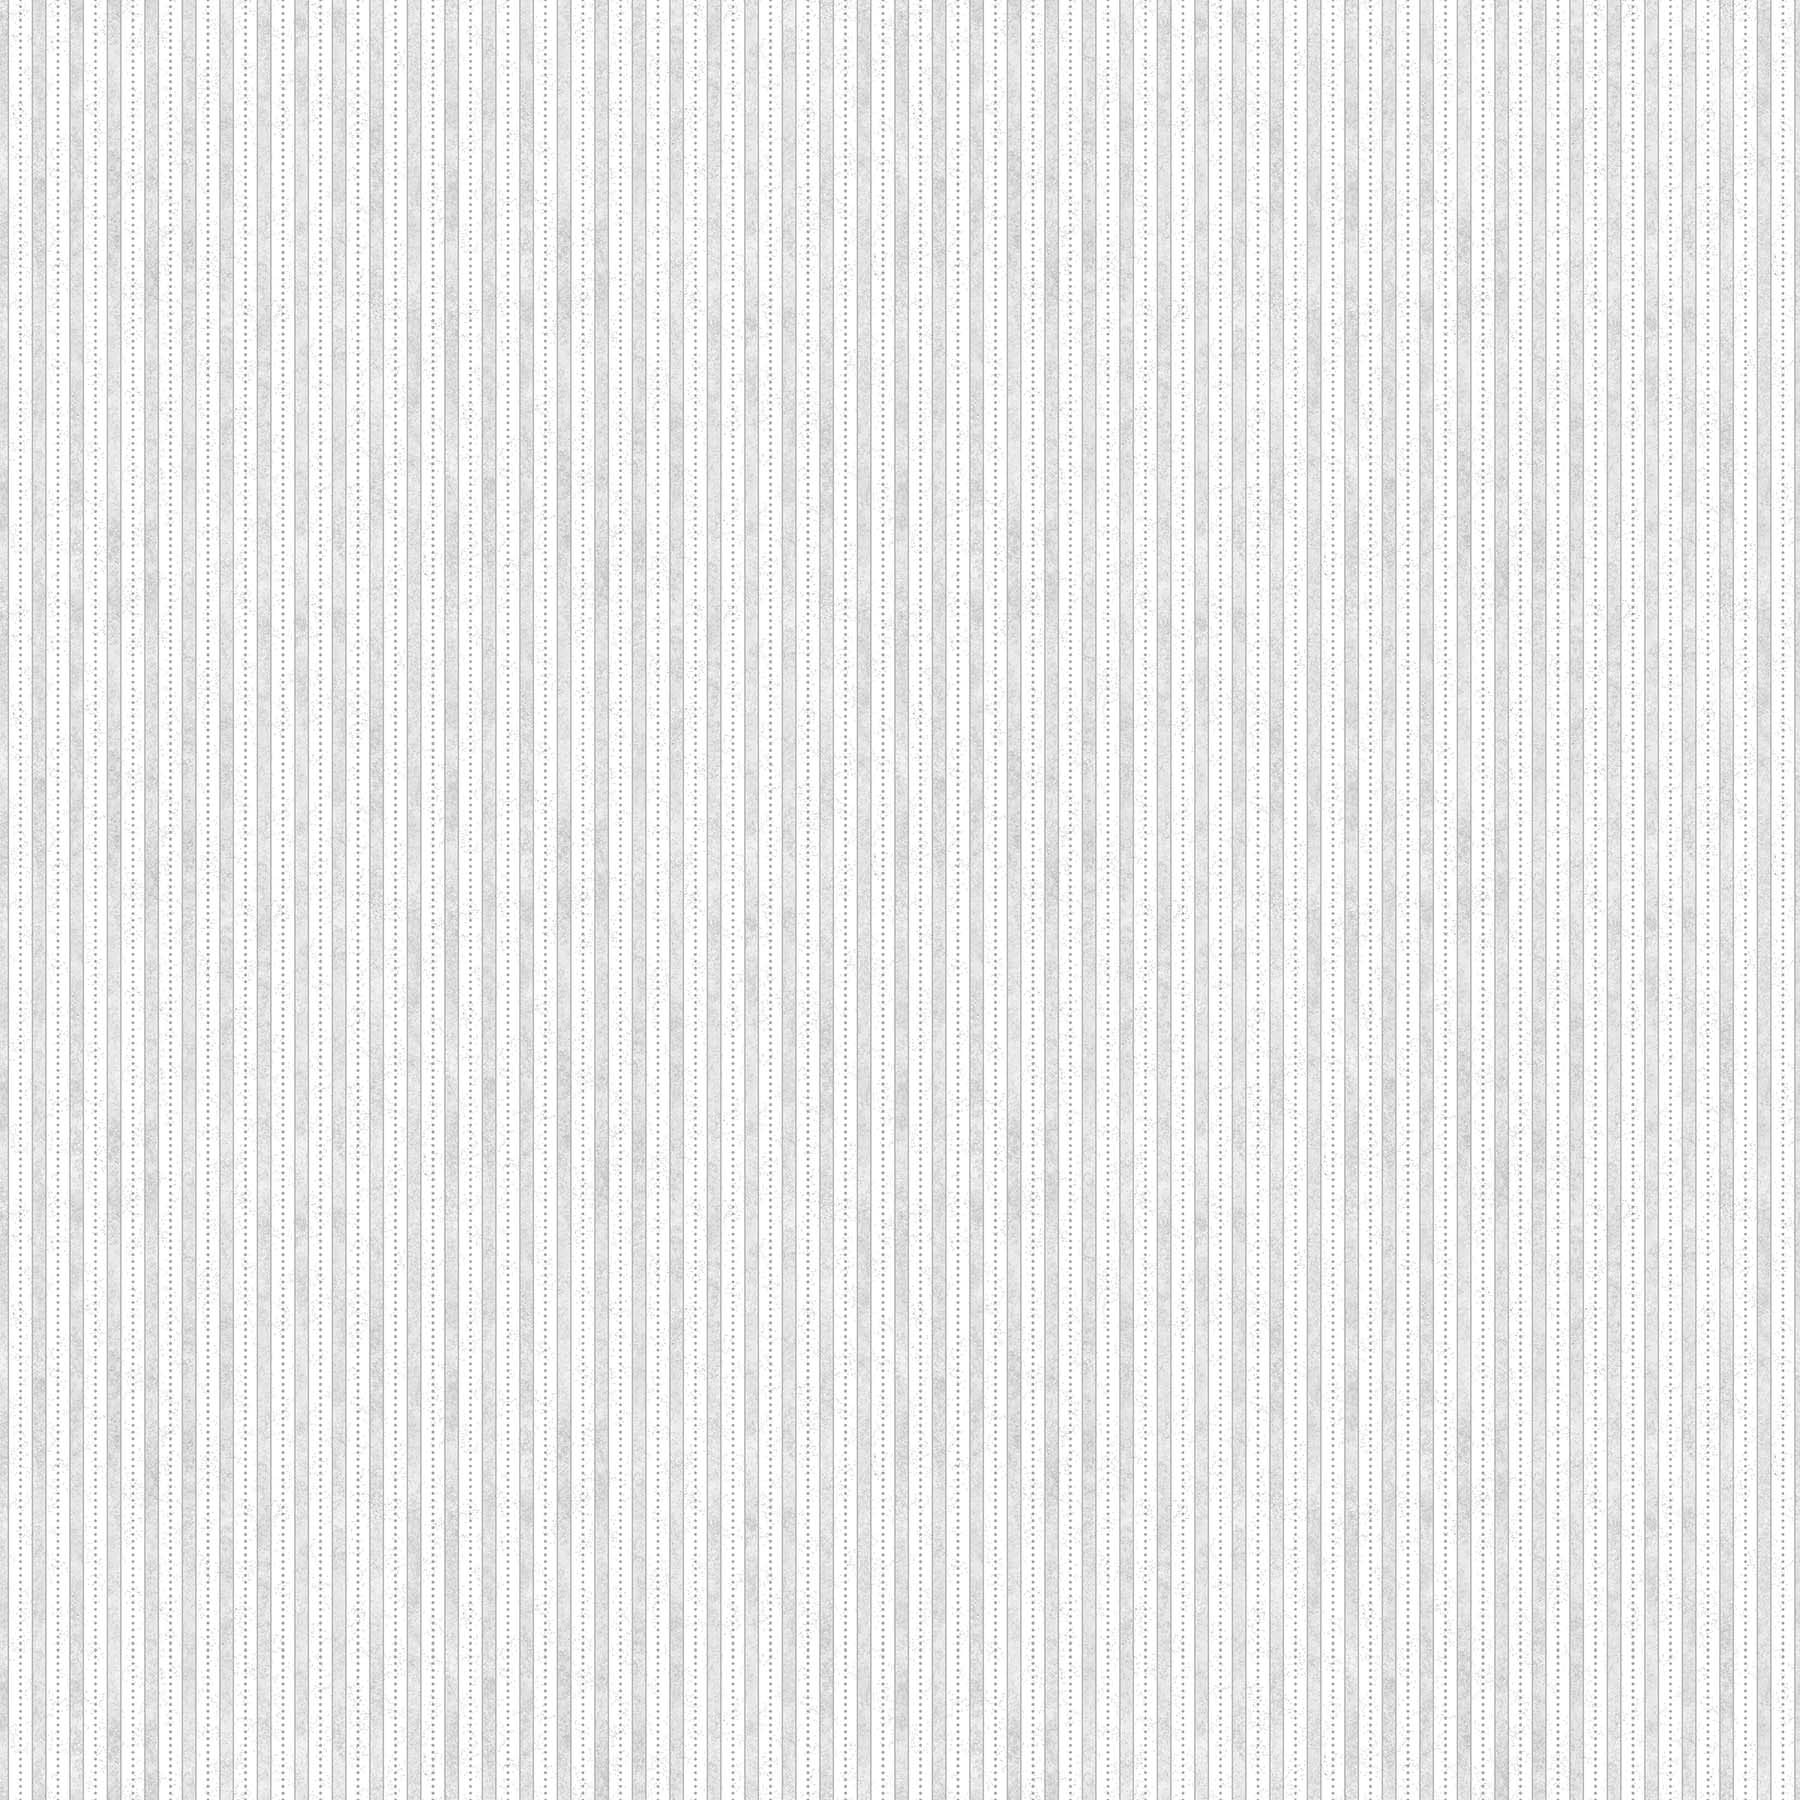 SHIMMER FROST WHITE SILVER STRIPE